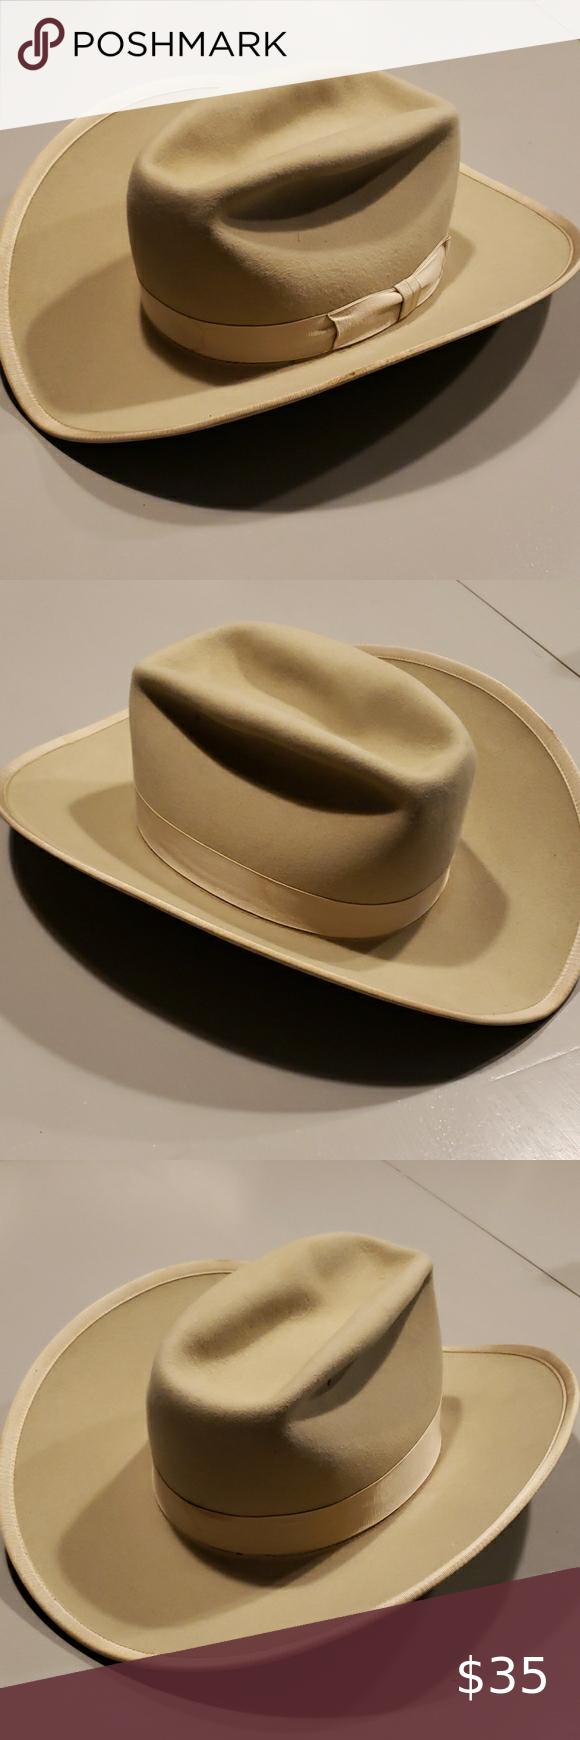 Beaver Blend Twenty Cowboy Hat Cowboy Hats The Twenties Cowboy